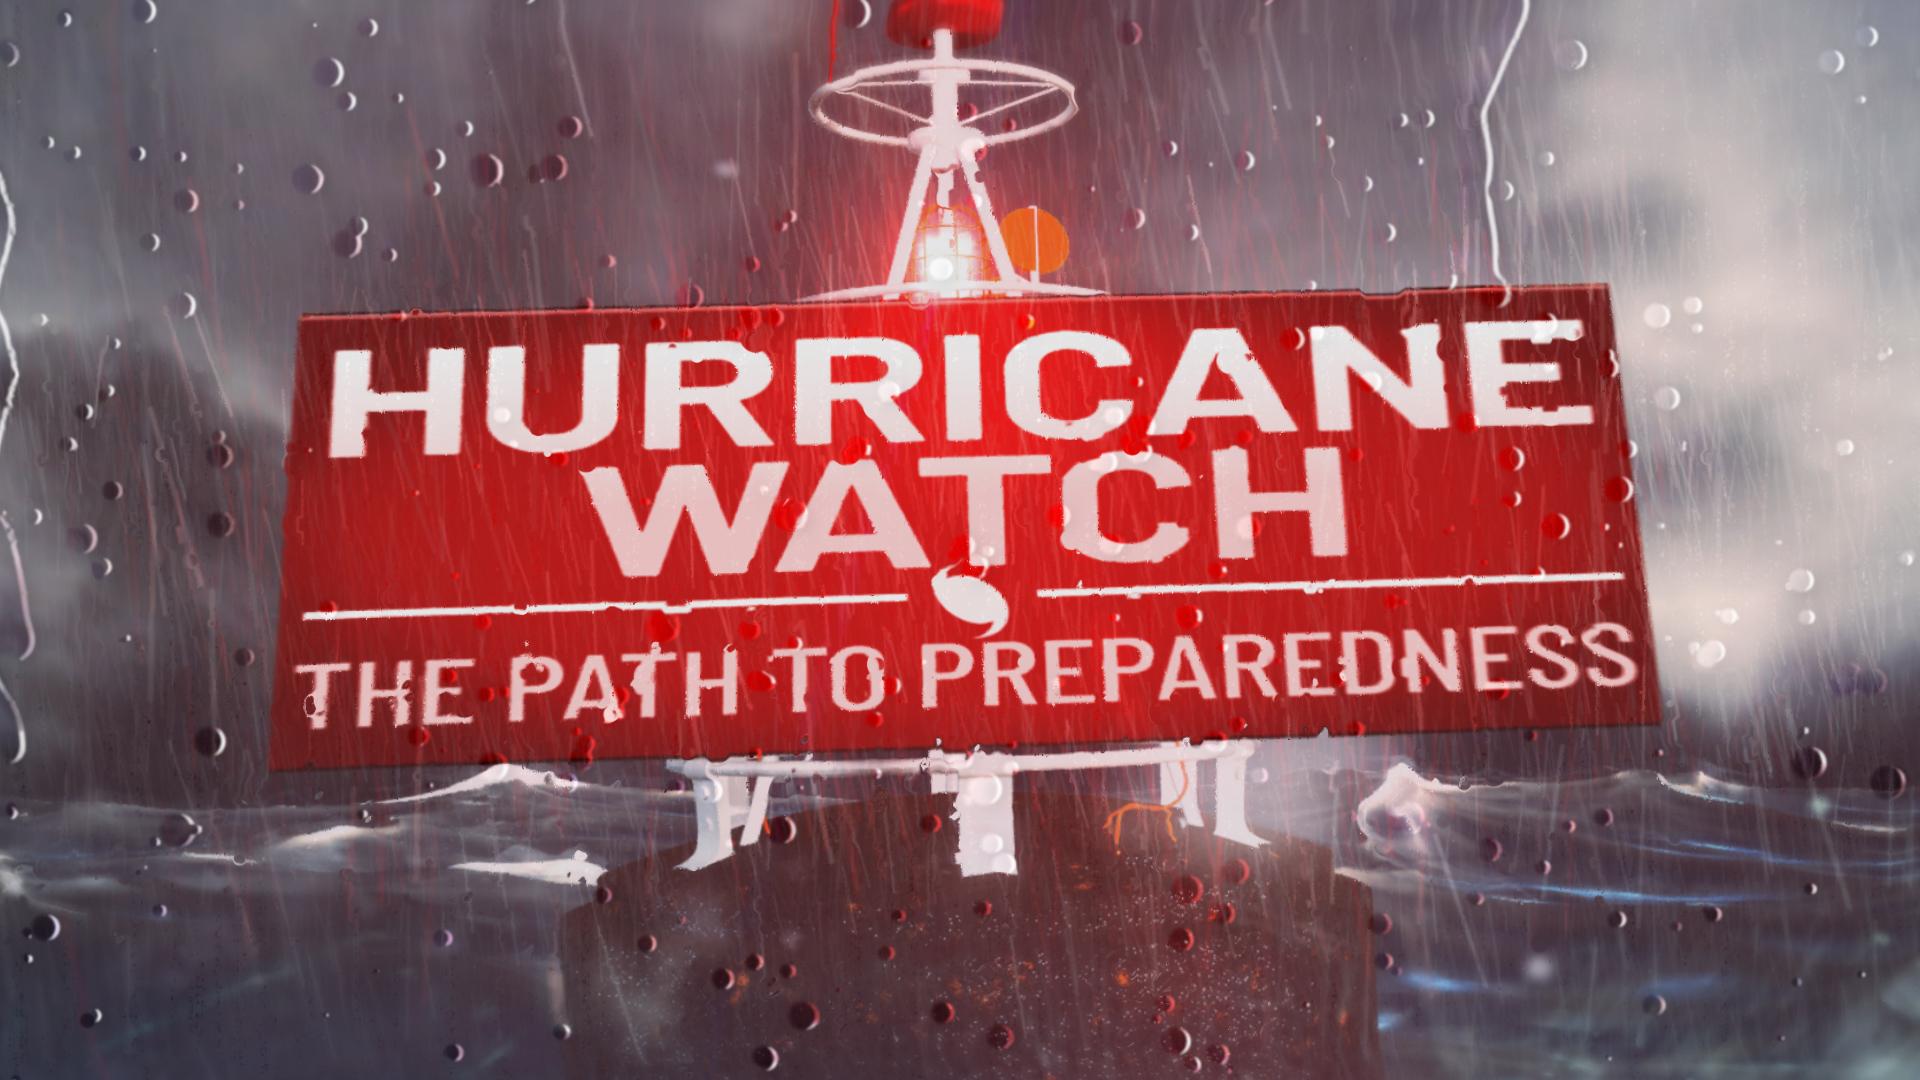 Hurricane-Watch-OPEN-SAMPLE_1556646745070.jpg